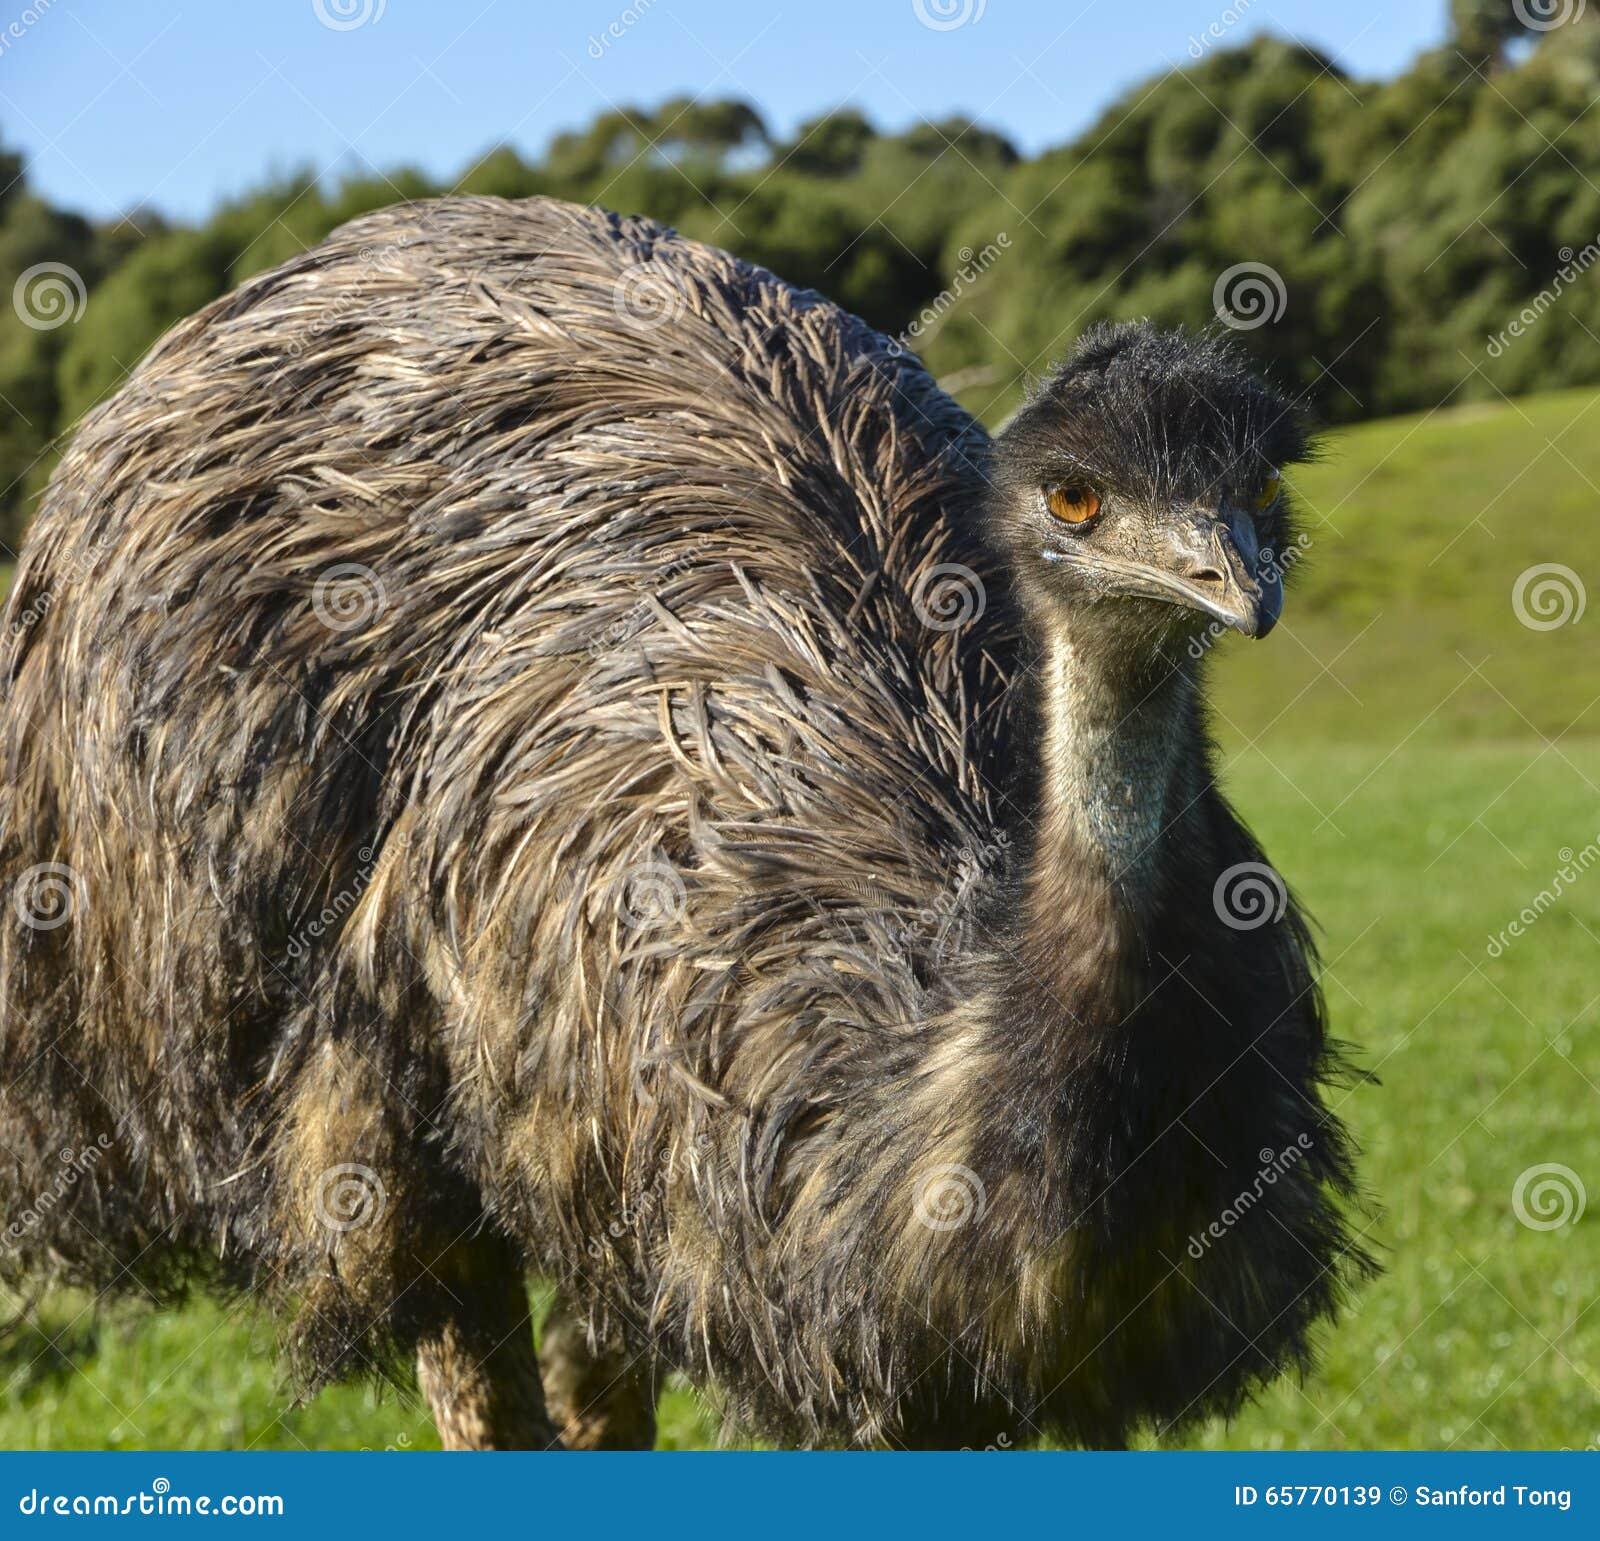 australian emu stock photo 65770139 megapixl